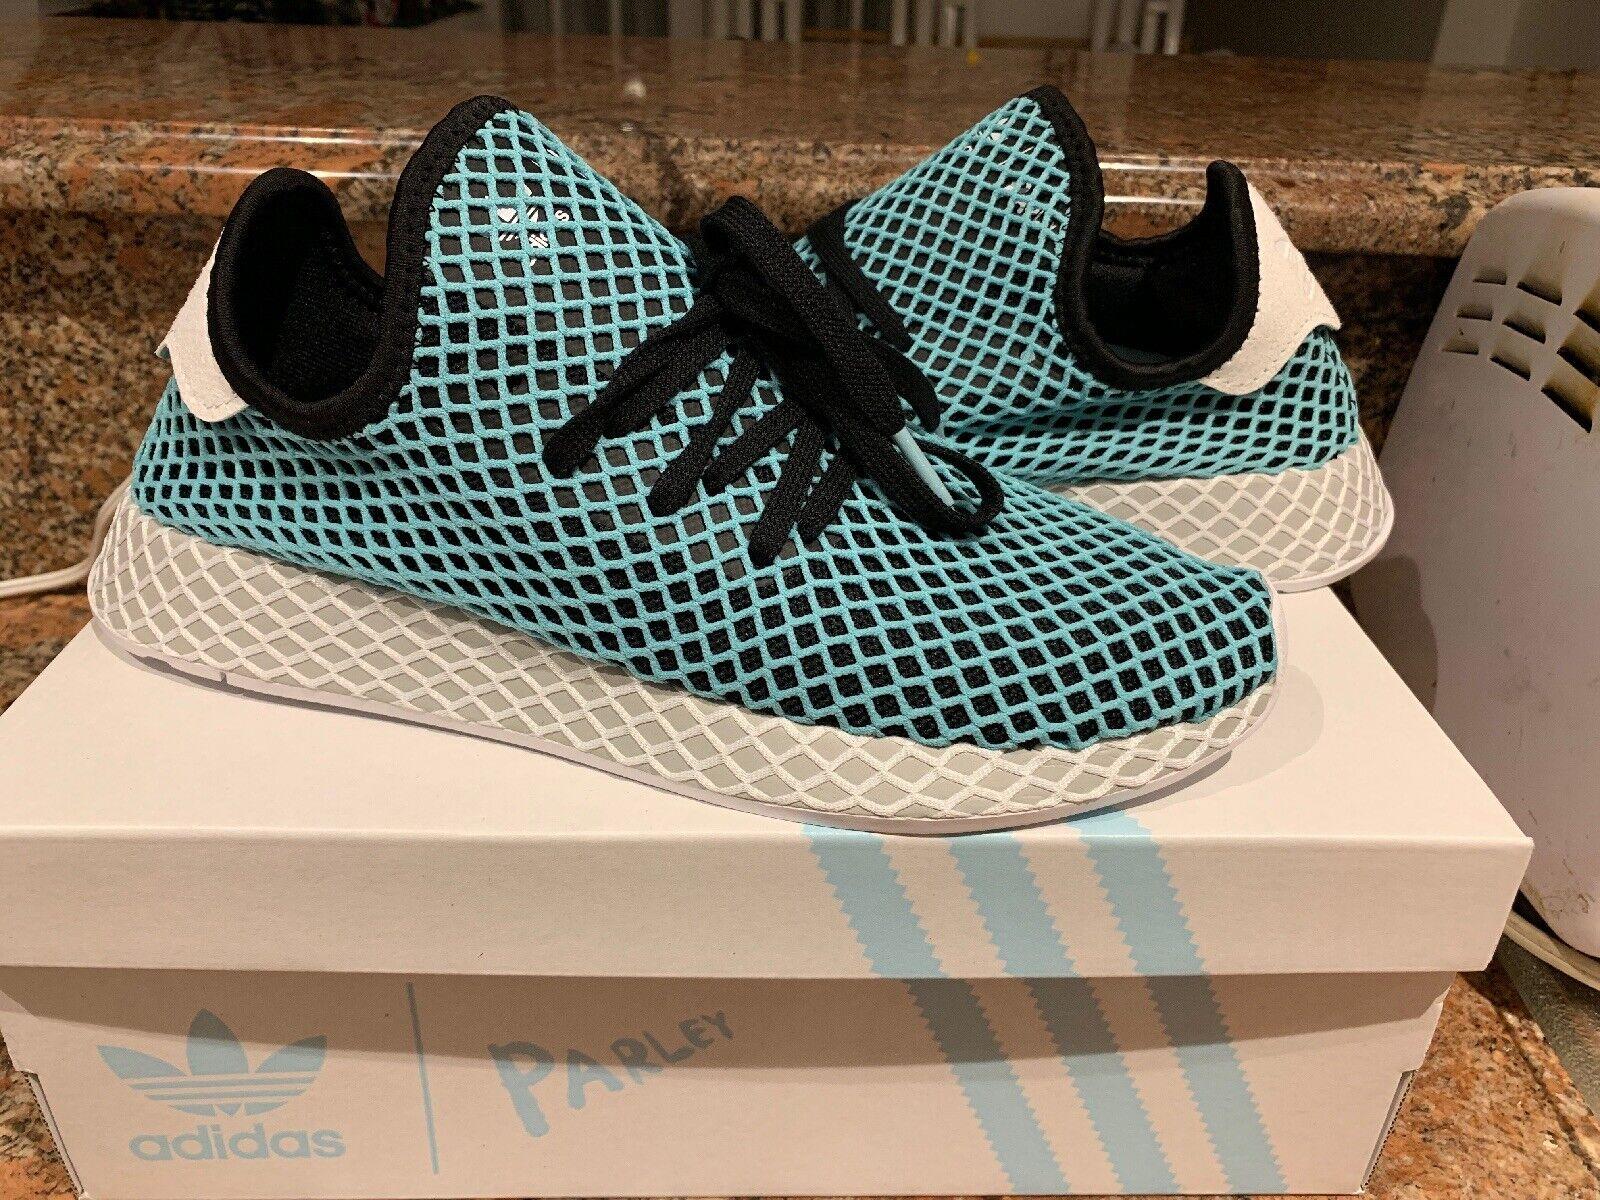 Adidas Originals Deerupt Runner Parley Black bluee Mens Sneakers CQ2623 Size 9